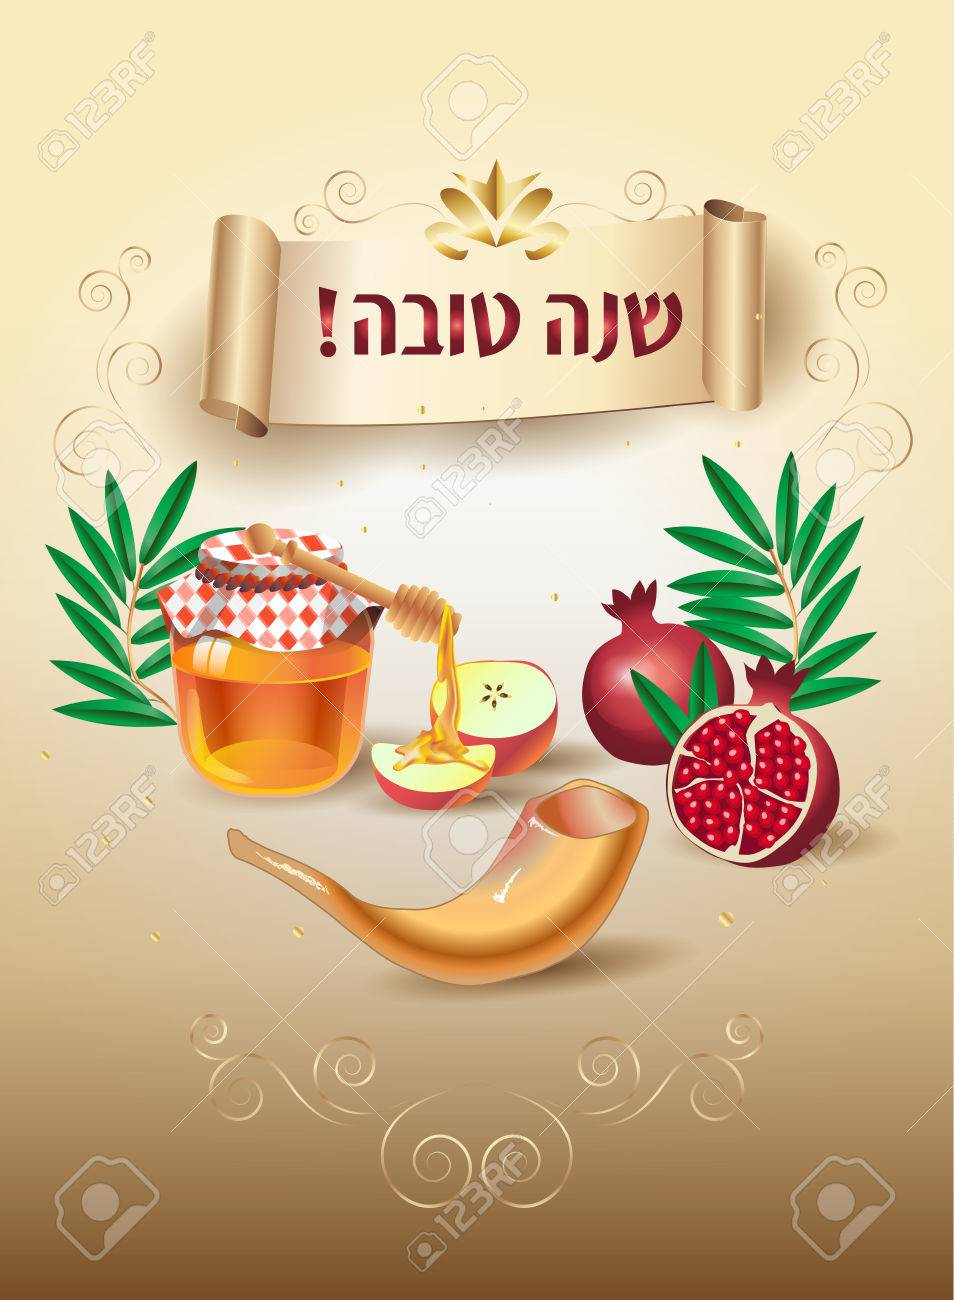 Shana Tova Hebrew Text Happy New Year Rosh Hashanah Jewish In 2020 Rosh Hashanah Rosh Hashanah Cards Rosh Hashanah Greetings